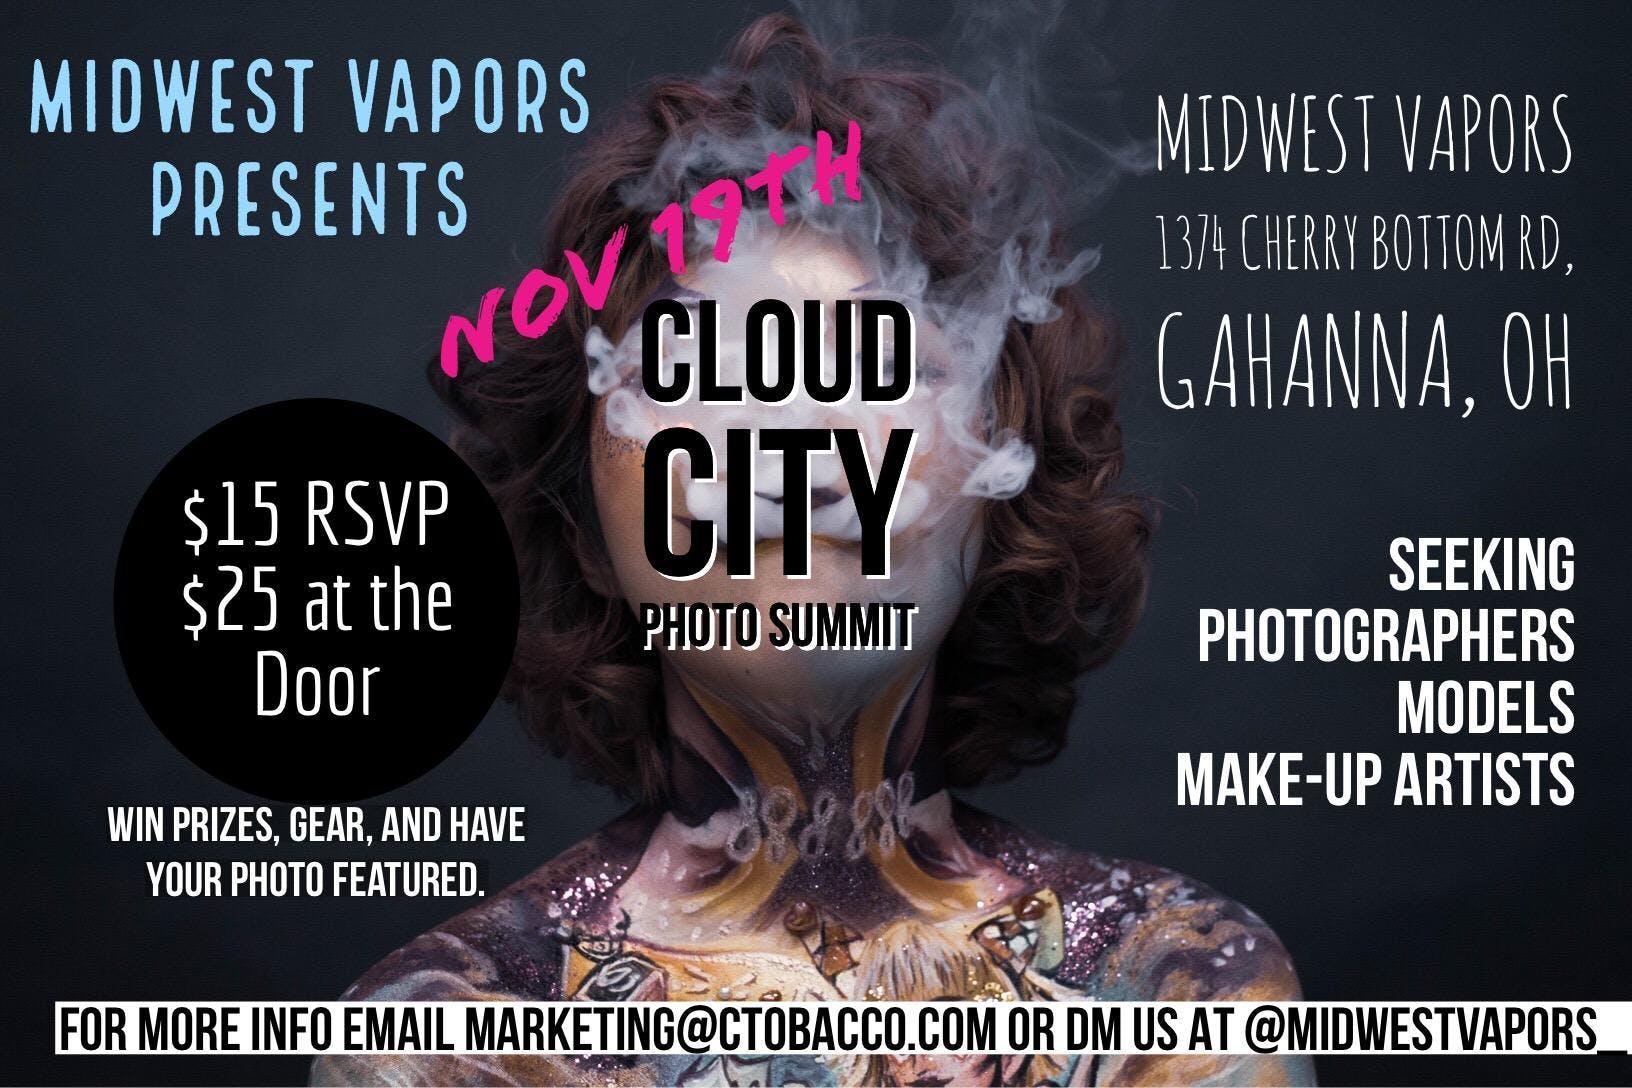 Cloud City Photo Meetup - 19 NOV 2018